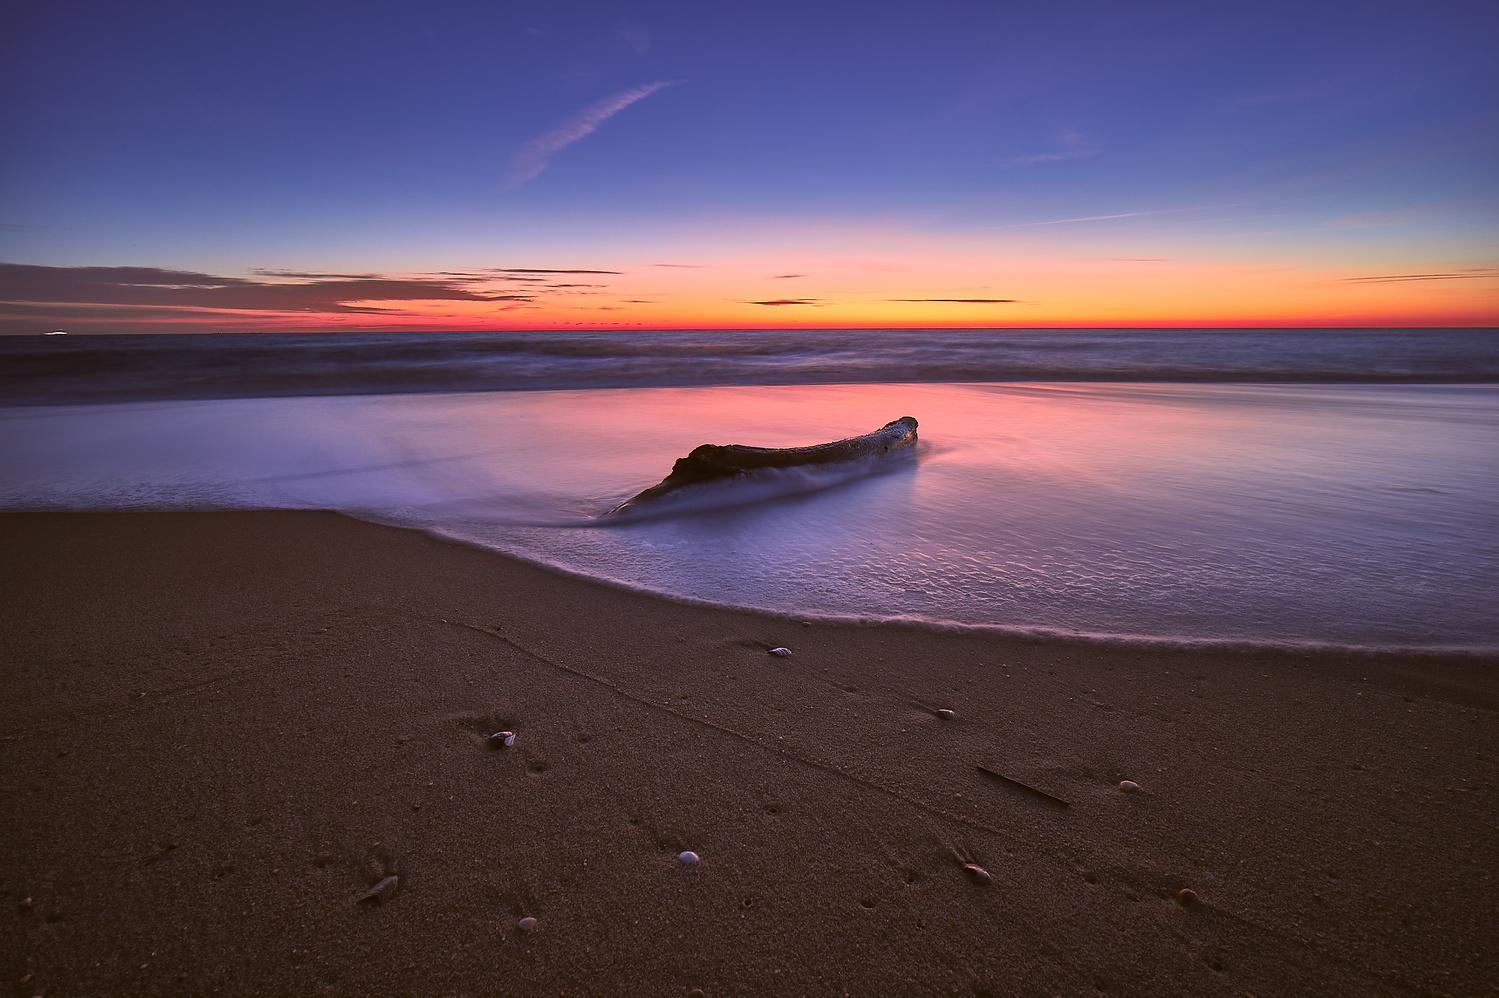 Sunrise at Sea by Jacob Roames